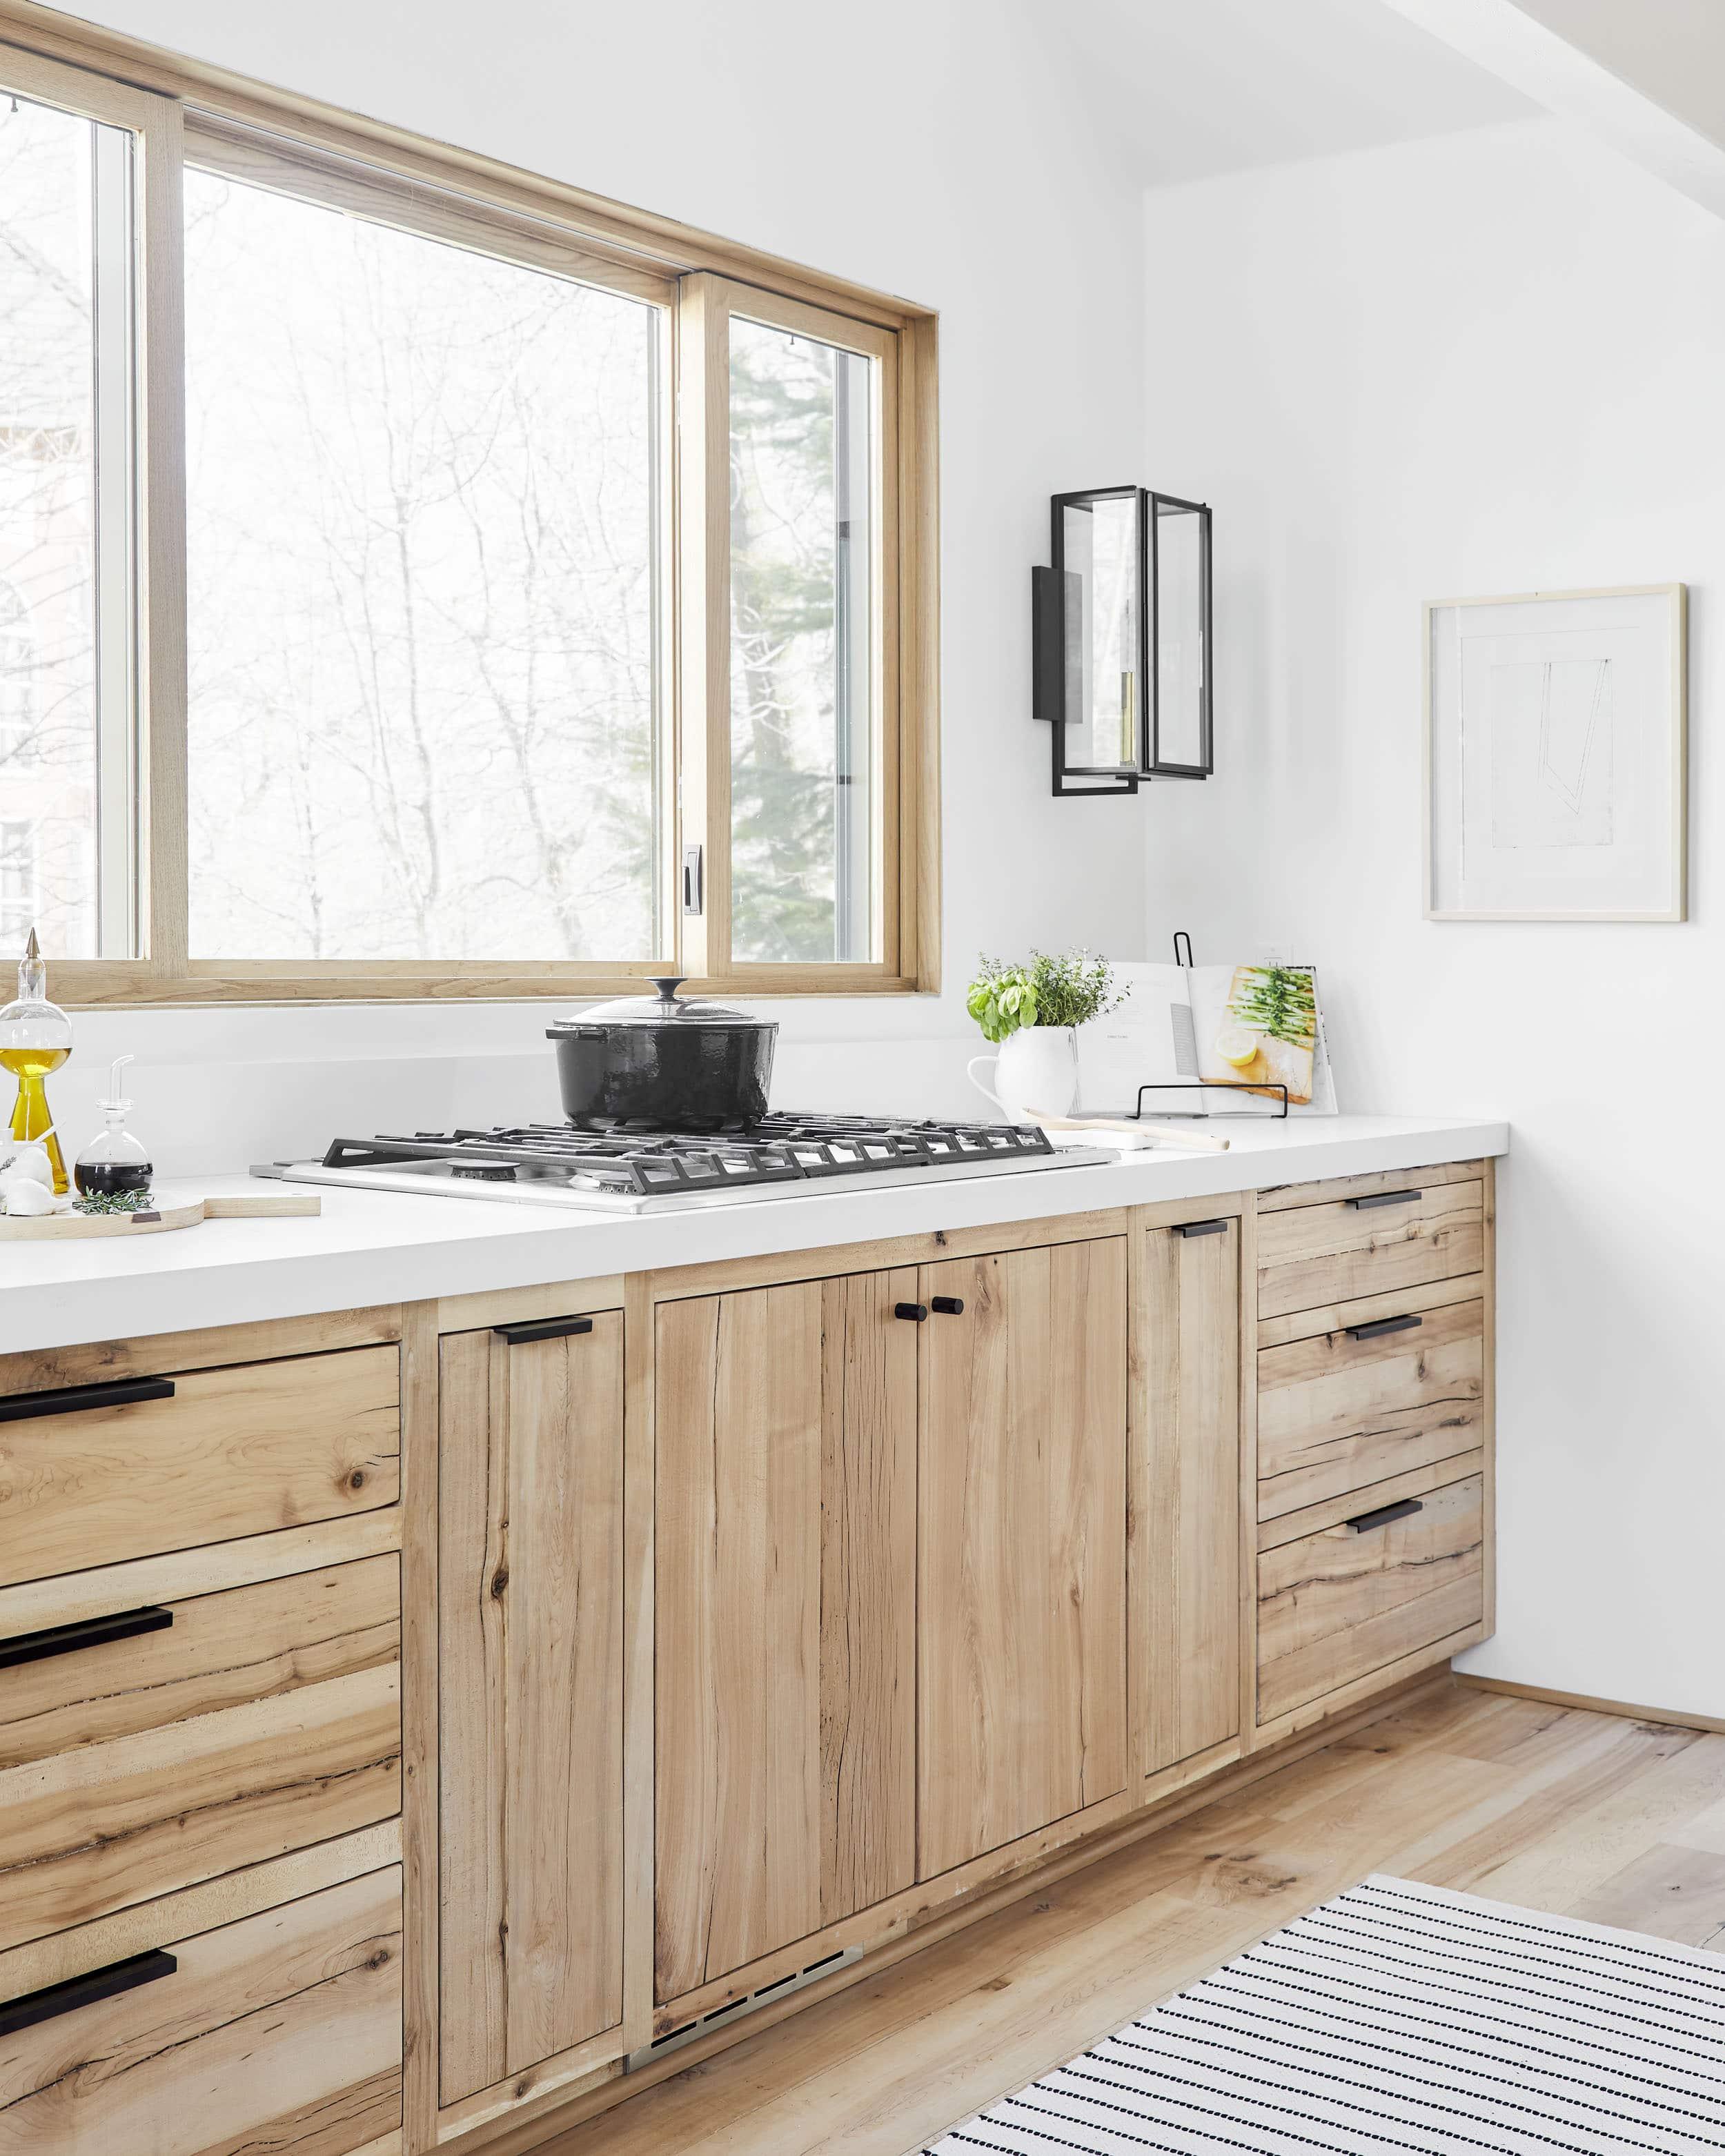 Emily Henderson Mountain House Scandinavian kitchen remodel_29